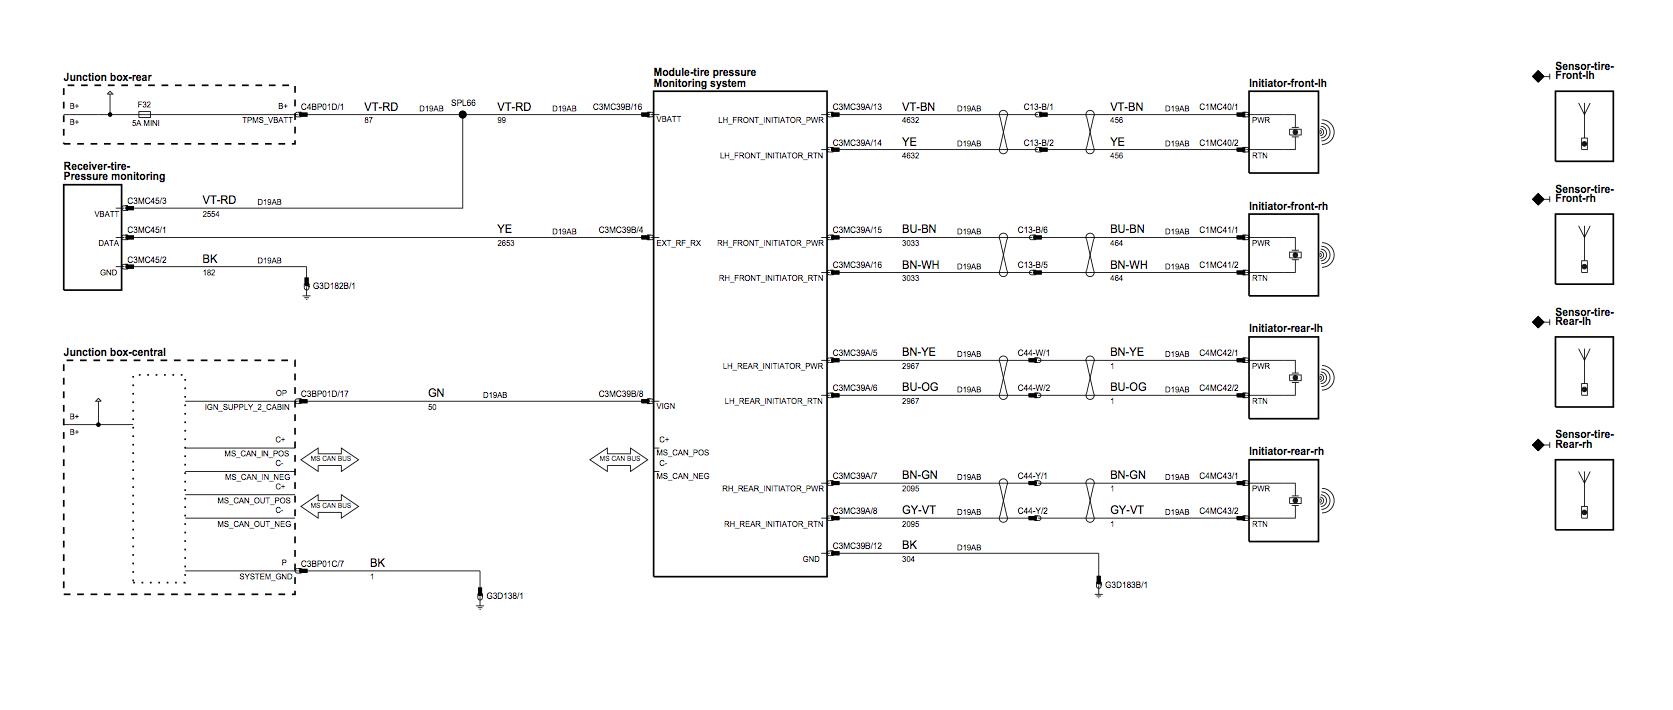 https://cimg6.ibsrv/gimg/www.jaguarforums-, Wiring diagram